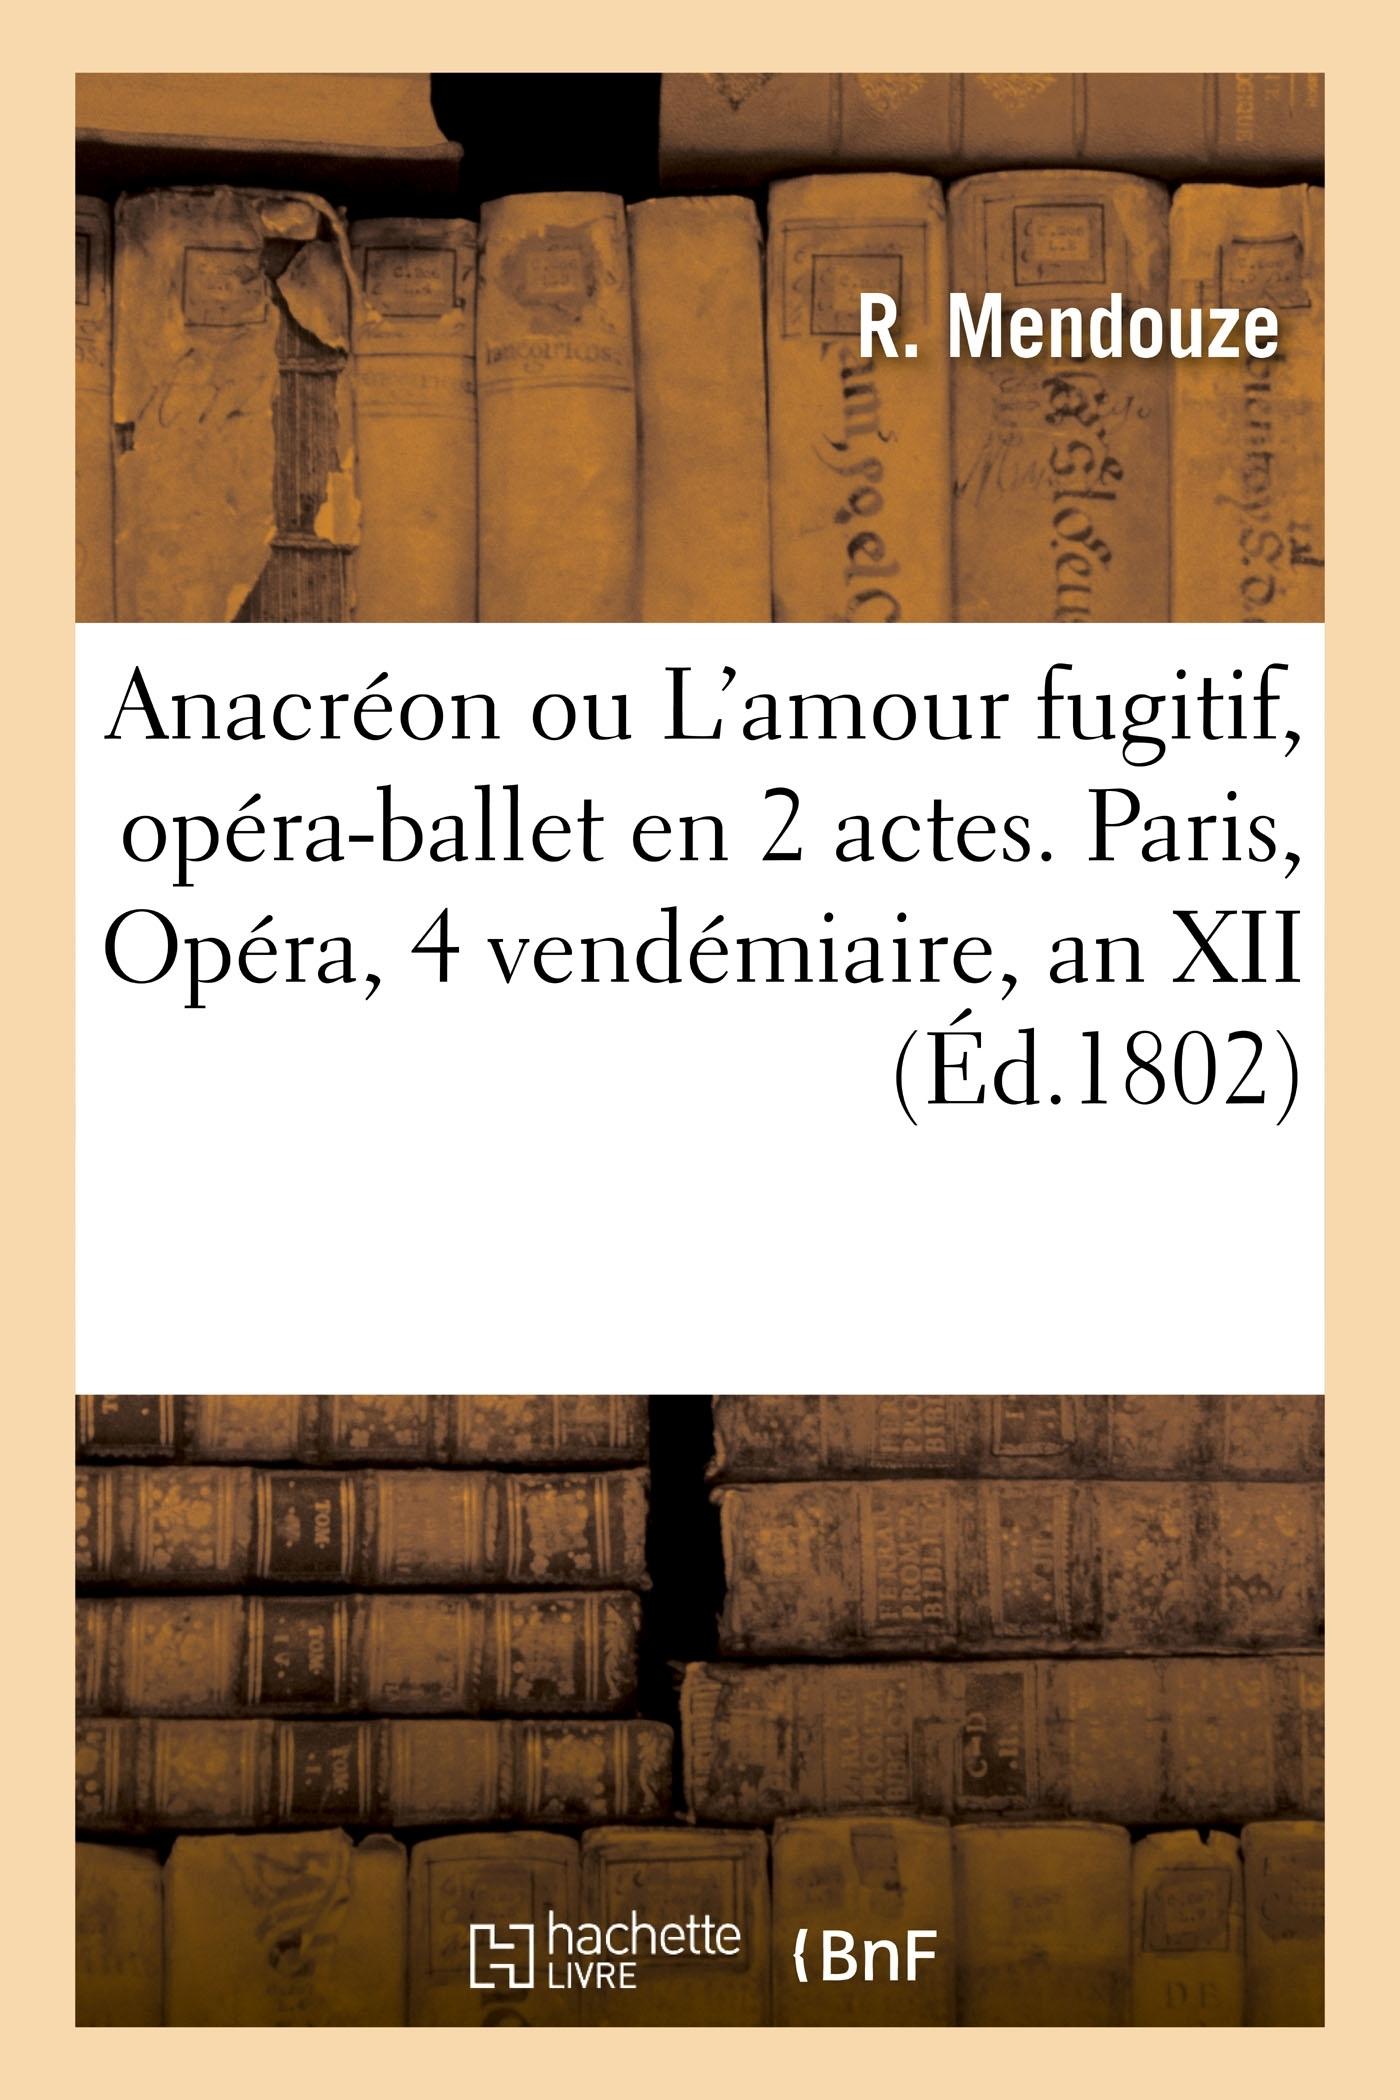 ANACREON OU L'AMOUR FUGITIF, OPERA-BALLET EN 2 ACTES. PARIS, OPERA, 4 VENDEMIAIRE, AN XII